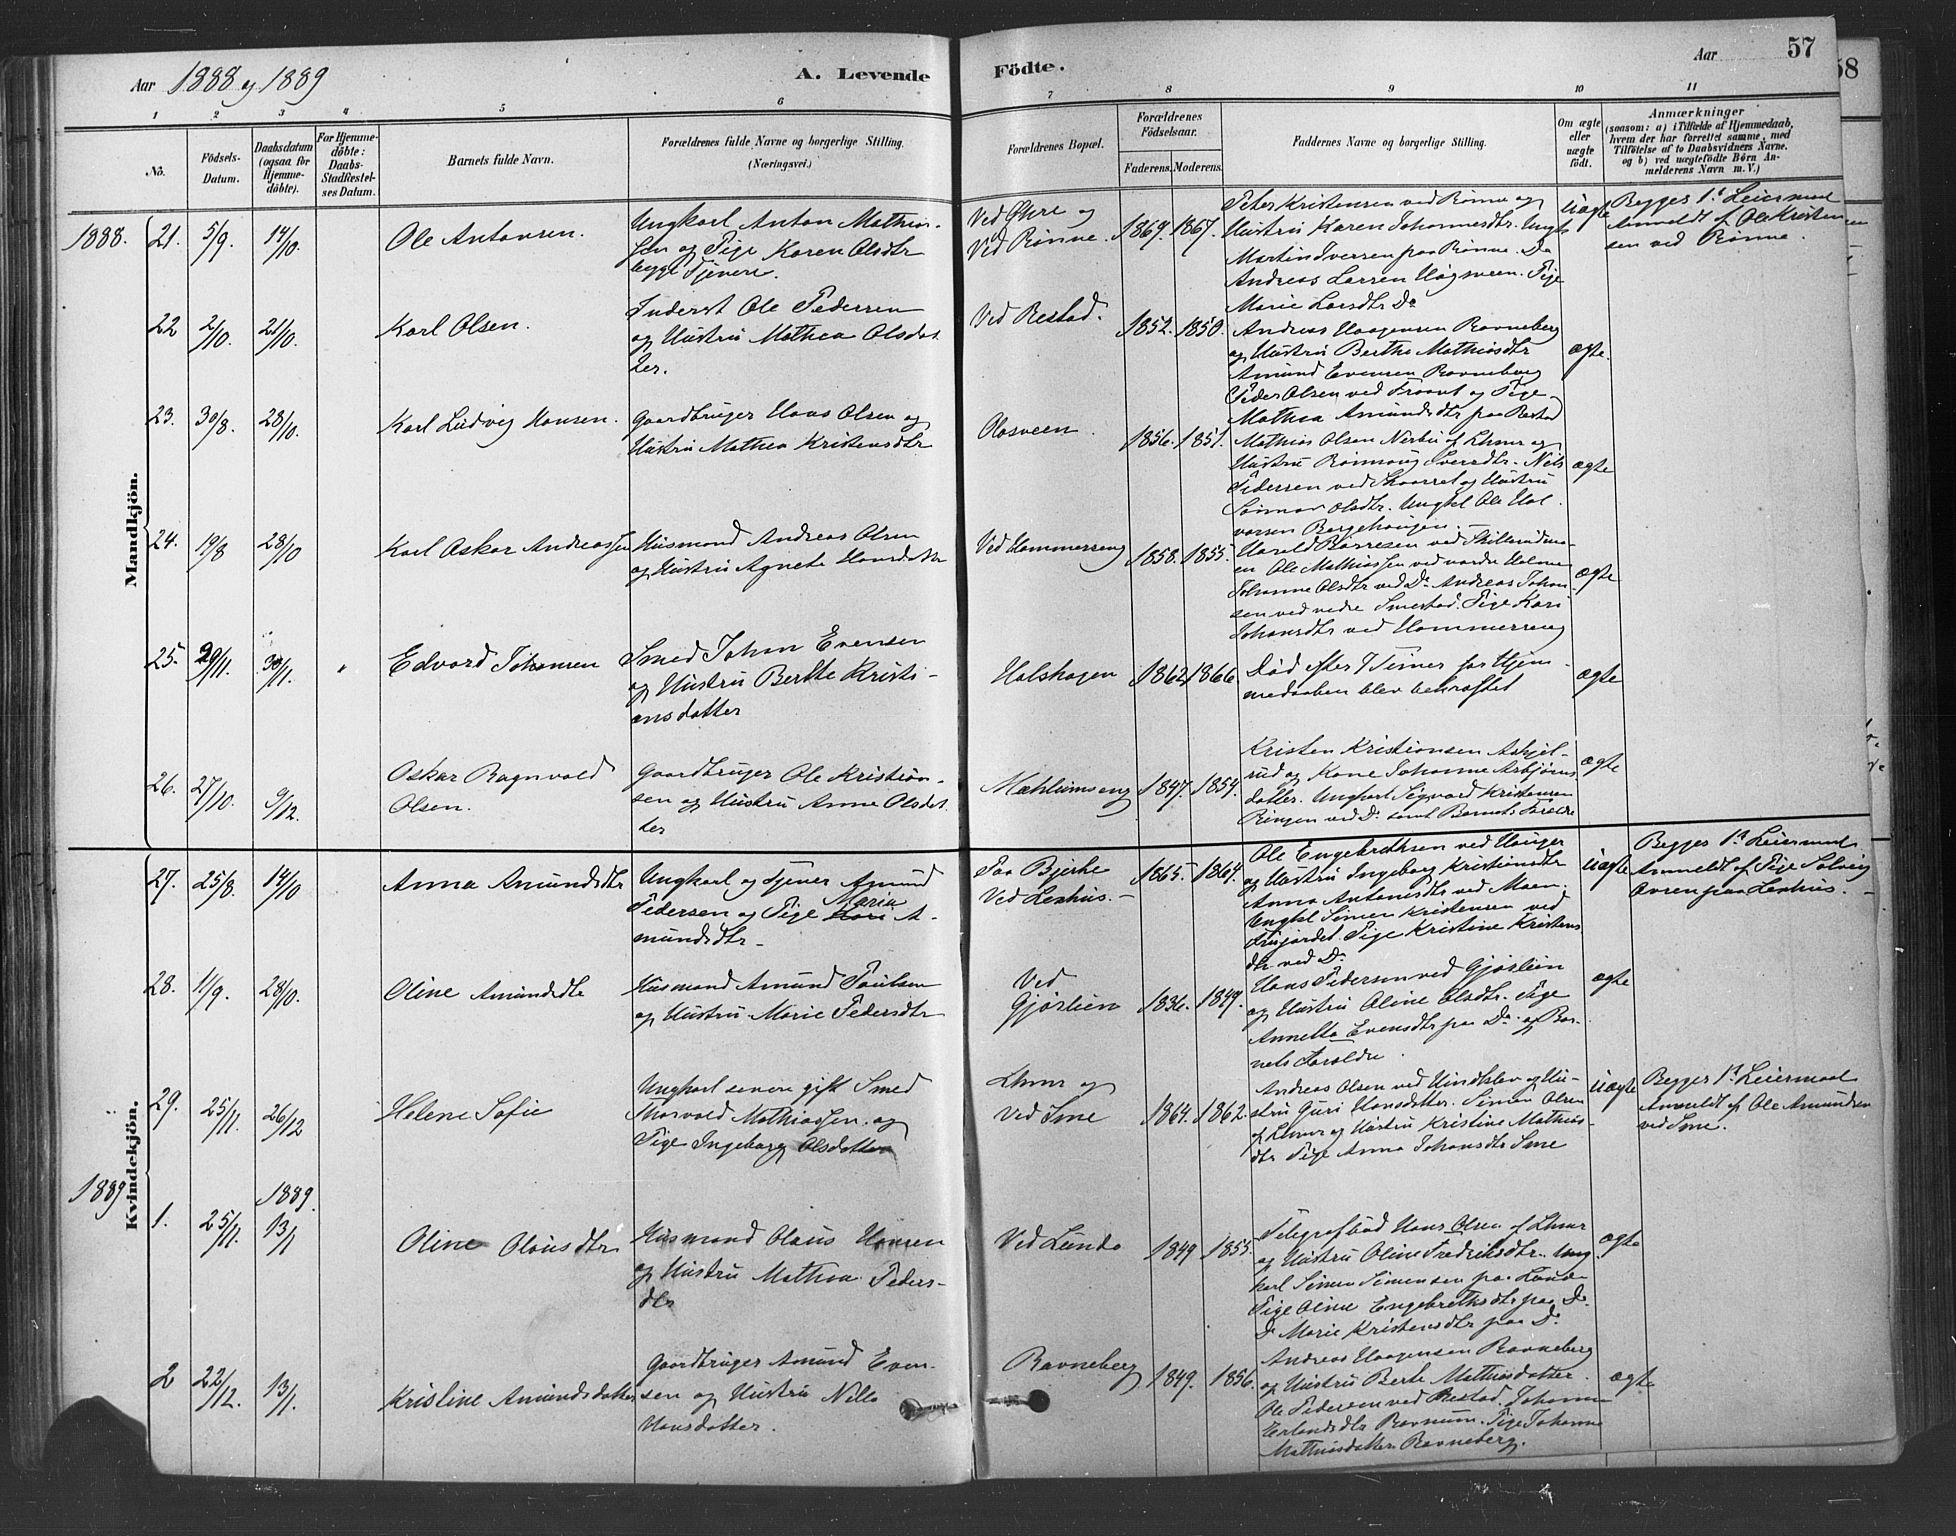 SAH, Fåberg prestekontor, Ministerialbok nr. 9, 1879-1898, s. 57